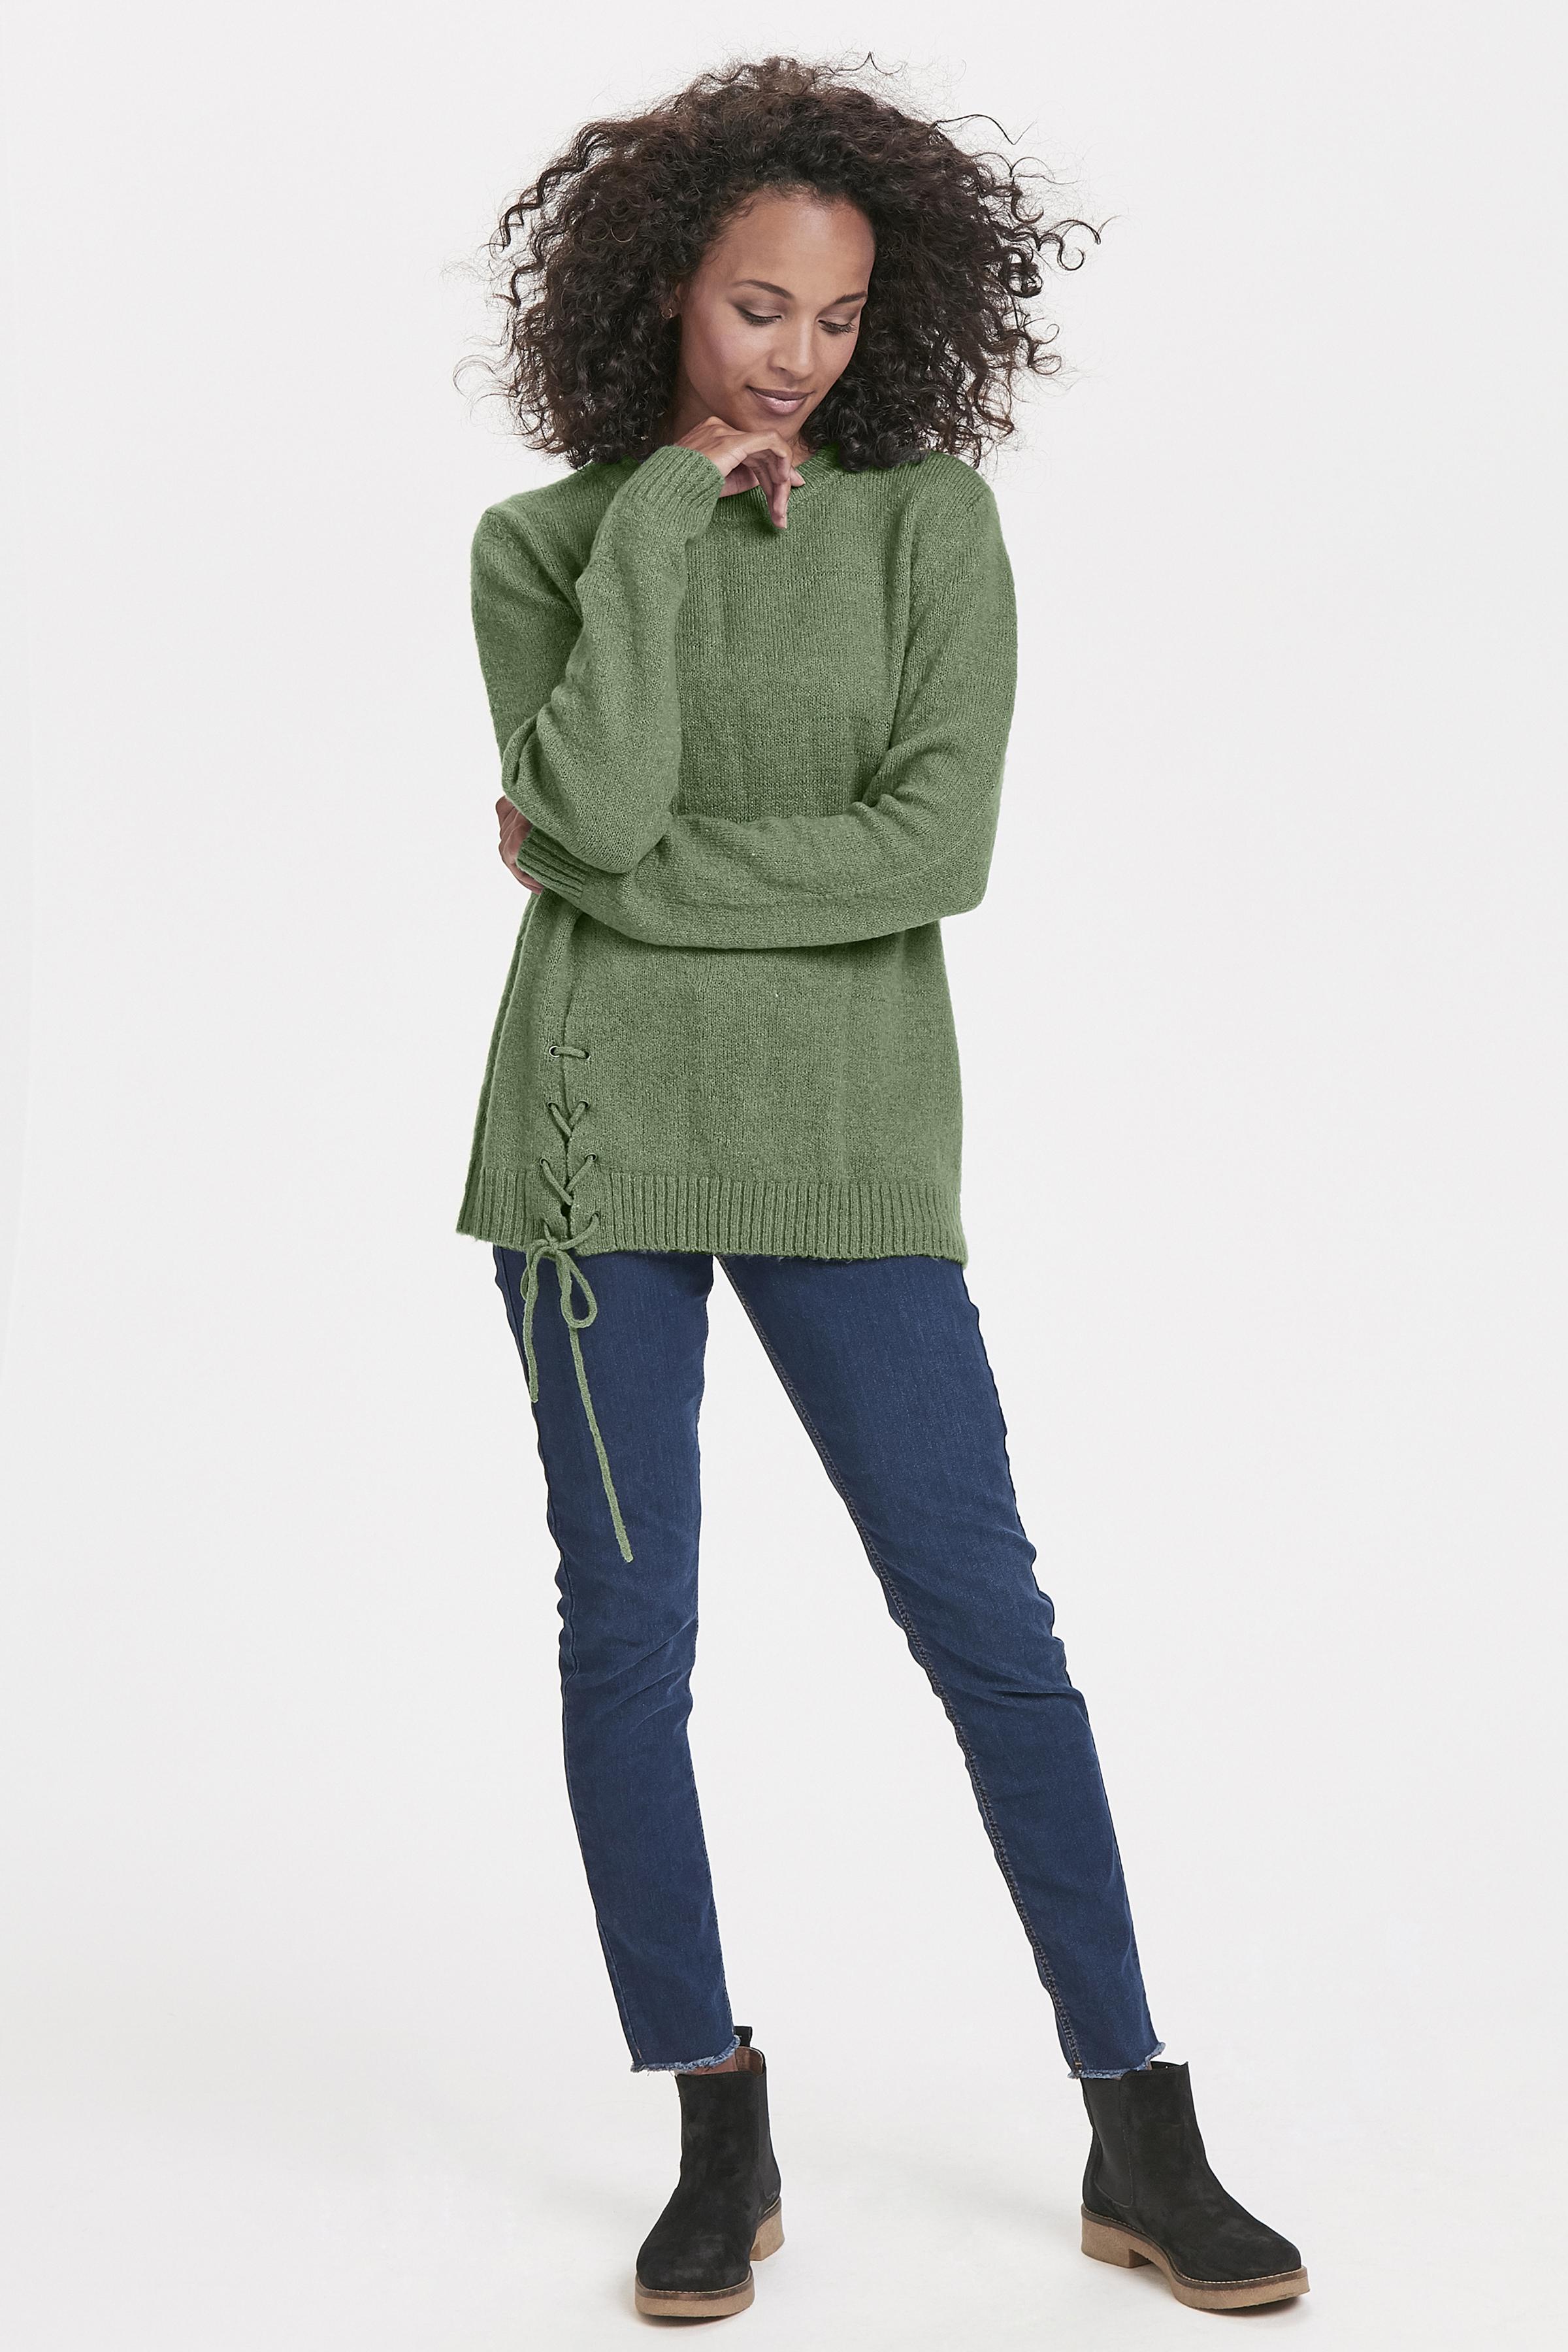 Opalgrön Stickad tröja från Bon'A Parte – Köp Opalgrön Stickad tröja från stl. S-2XL här